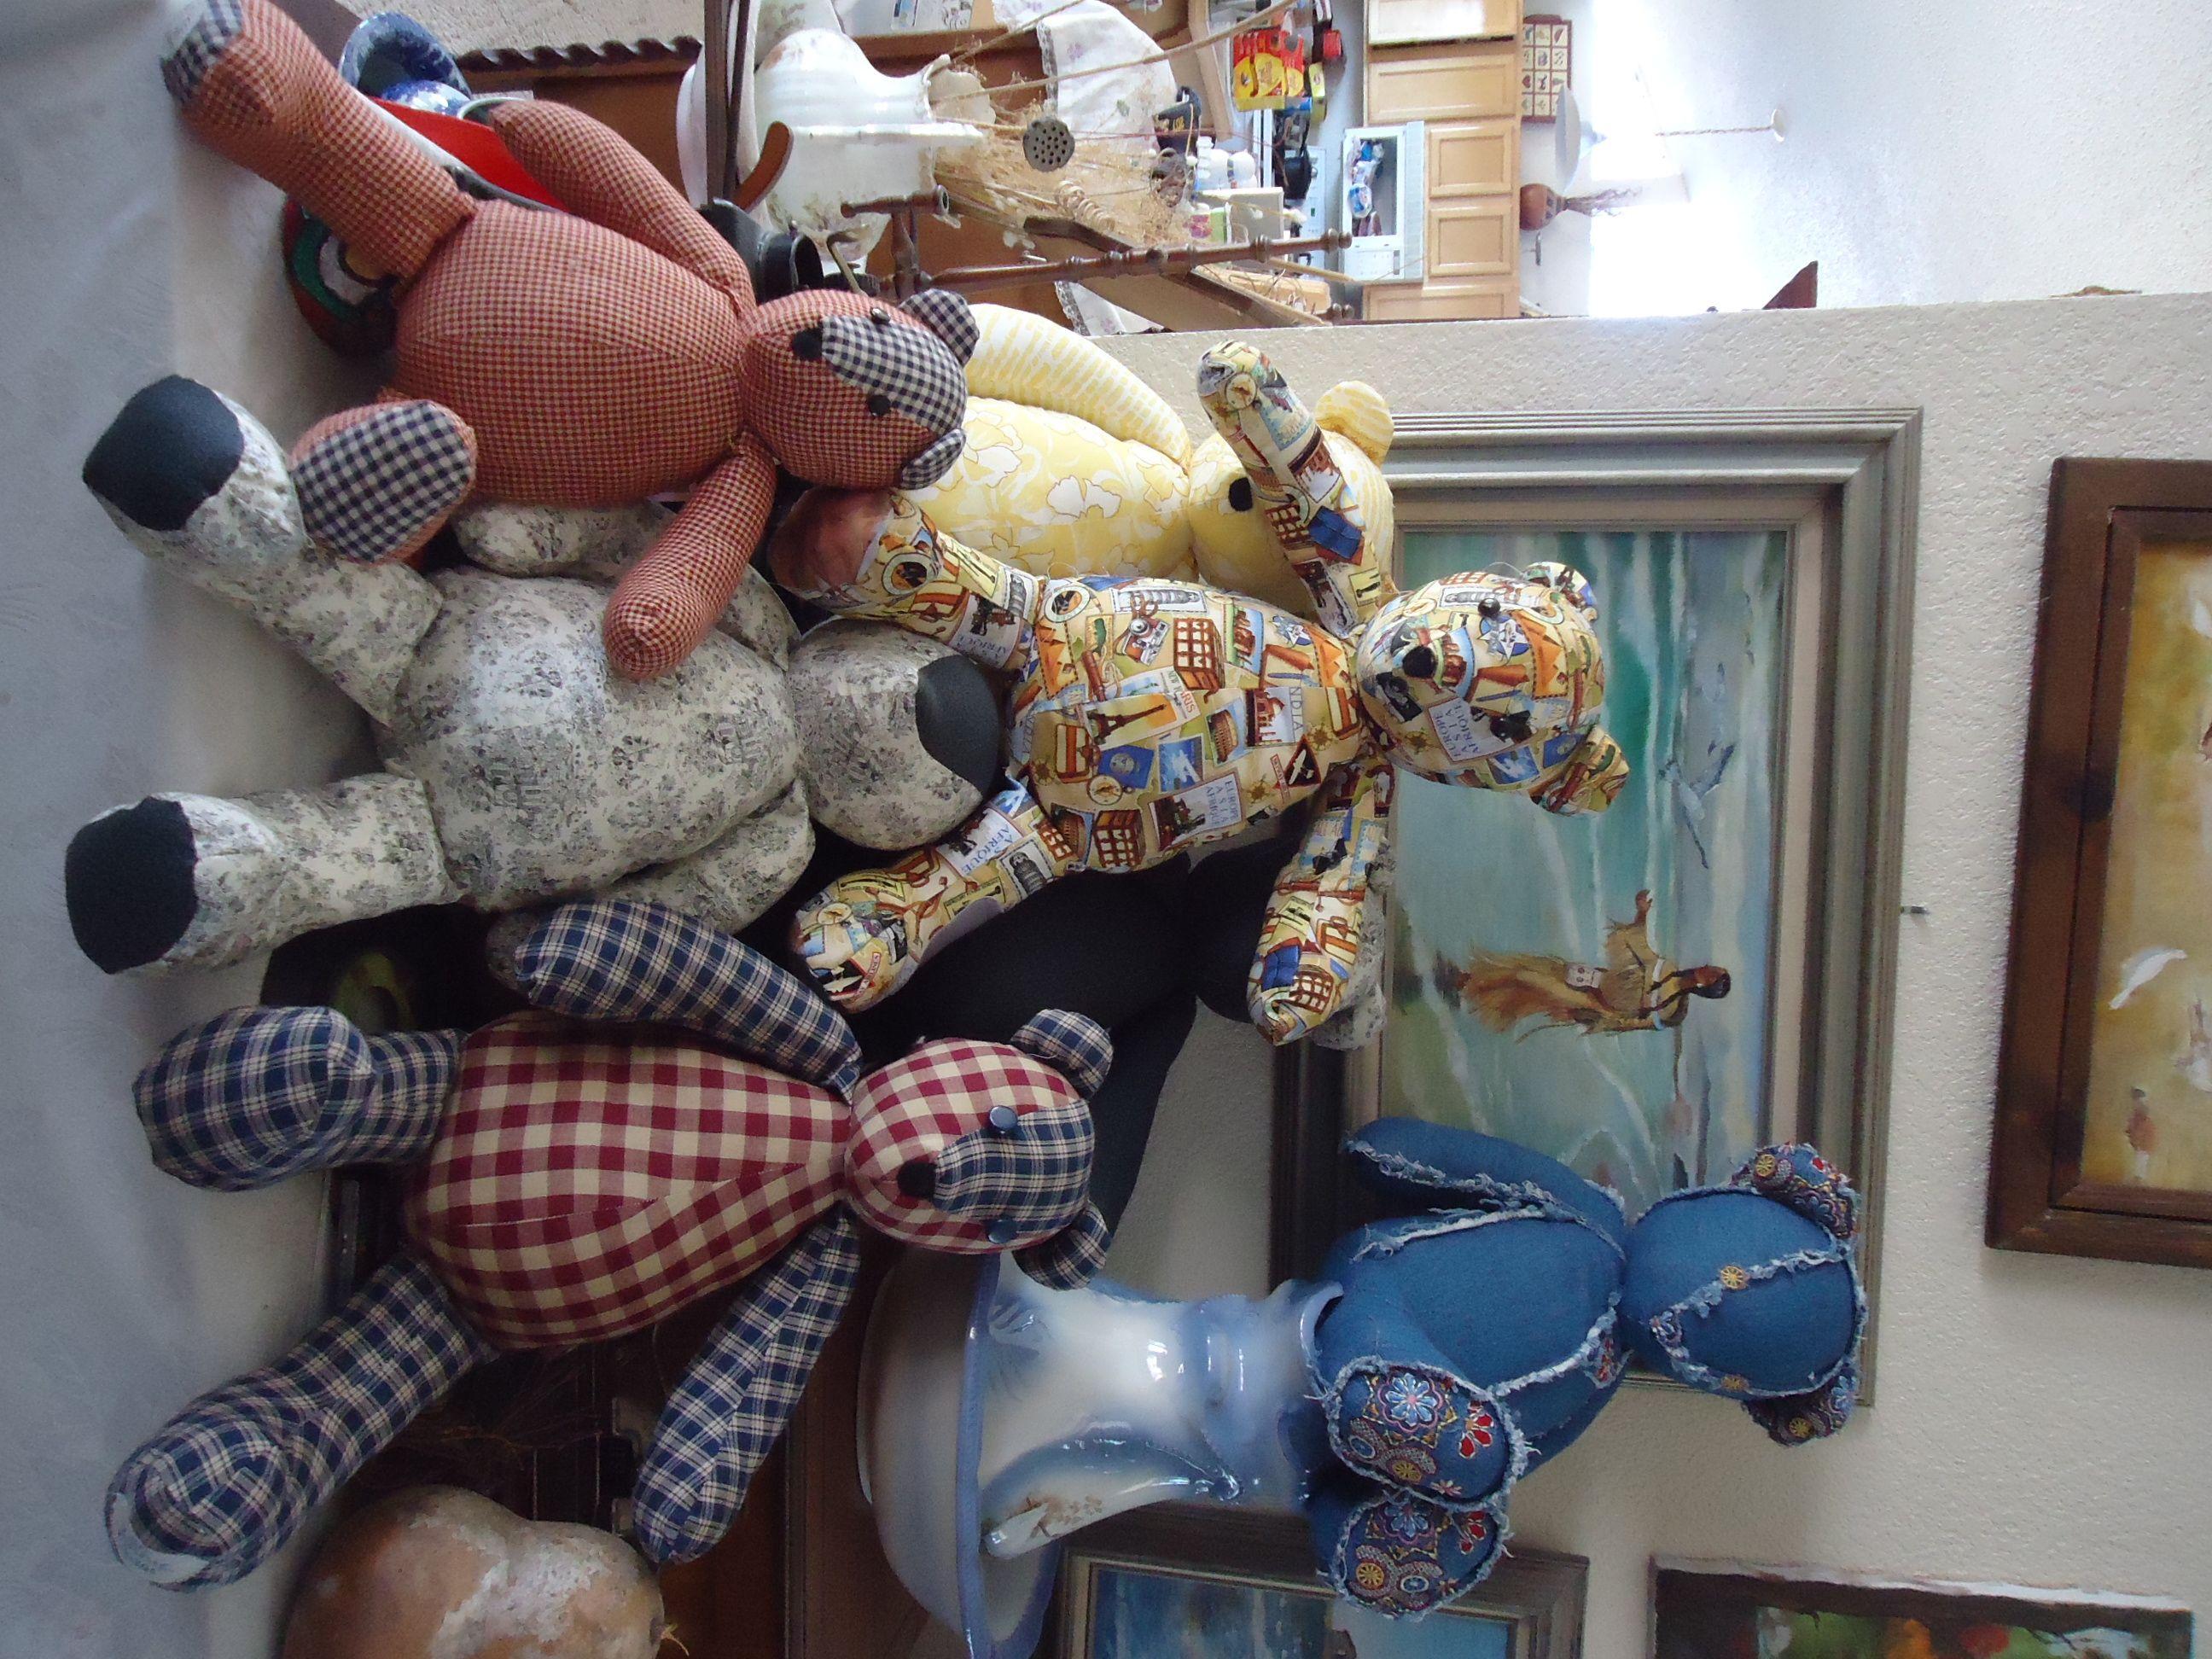 More of my bears